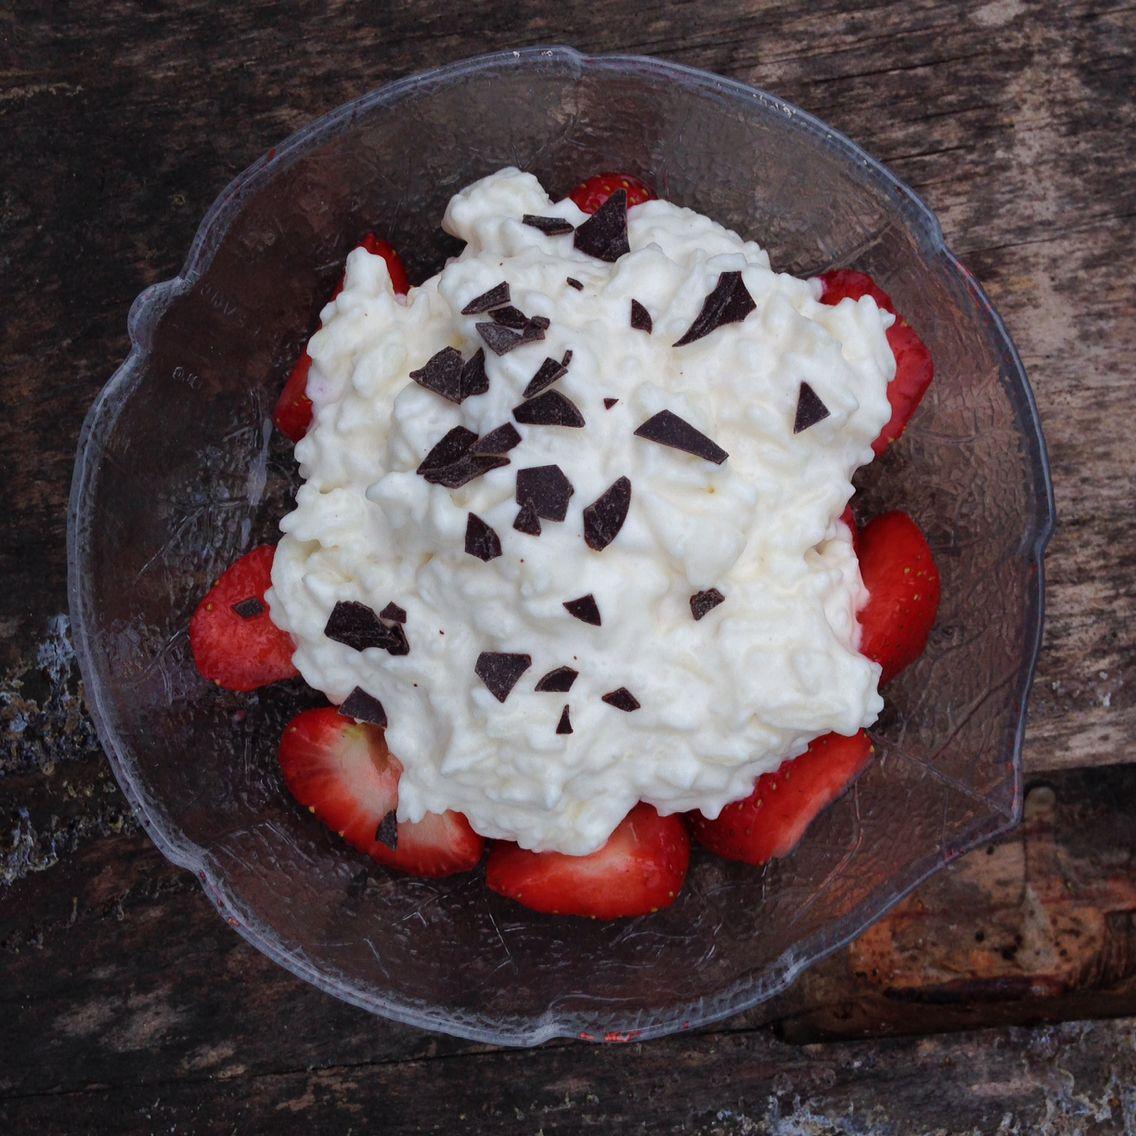 Erdbeeren unter Reispudding mit Schokostreuseln